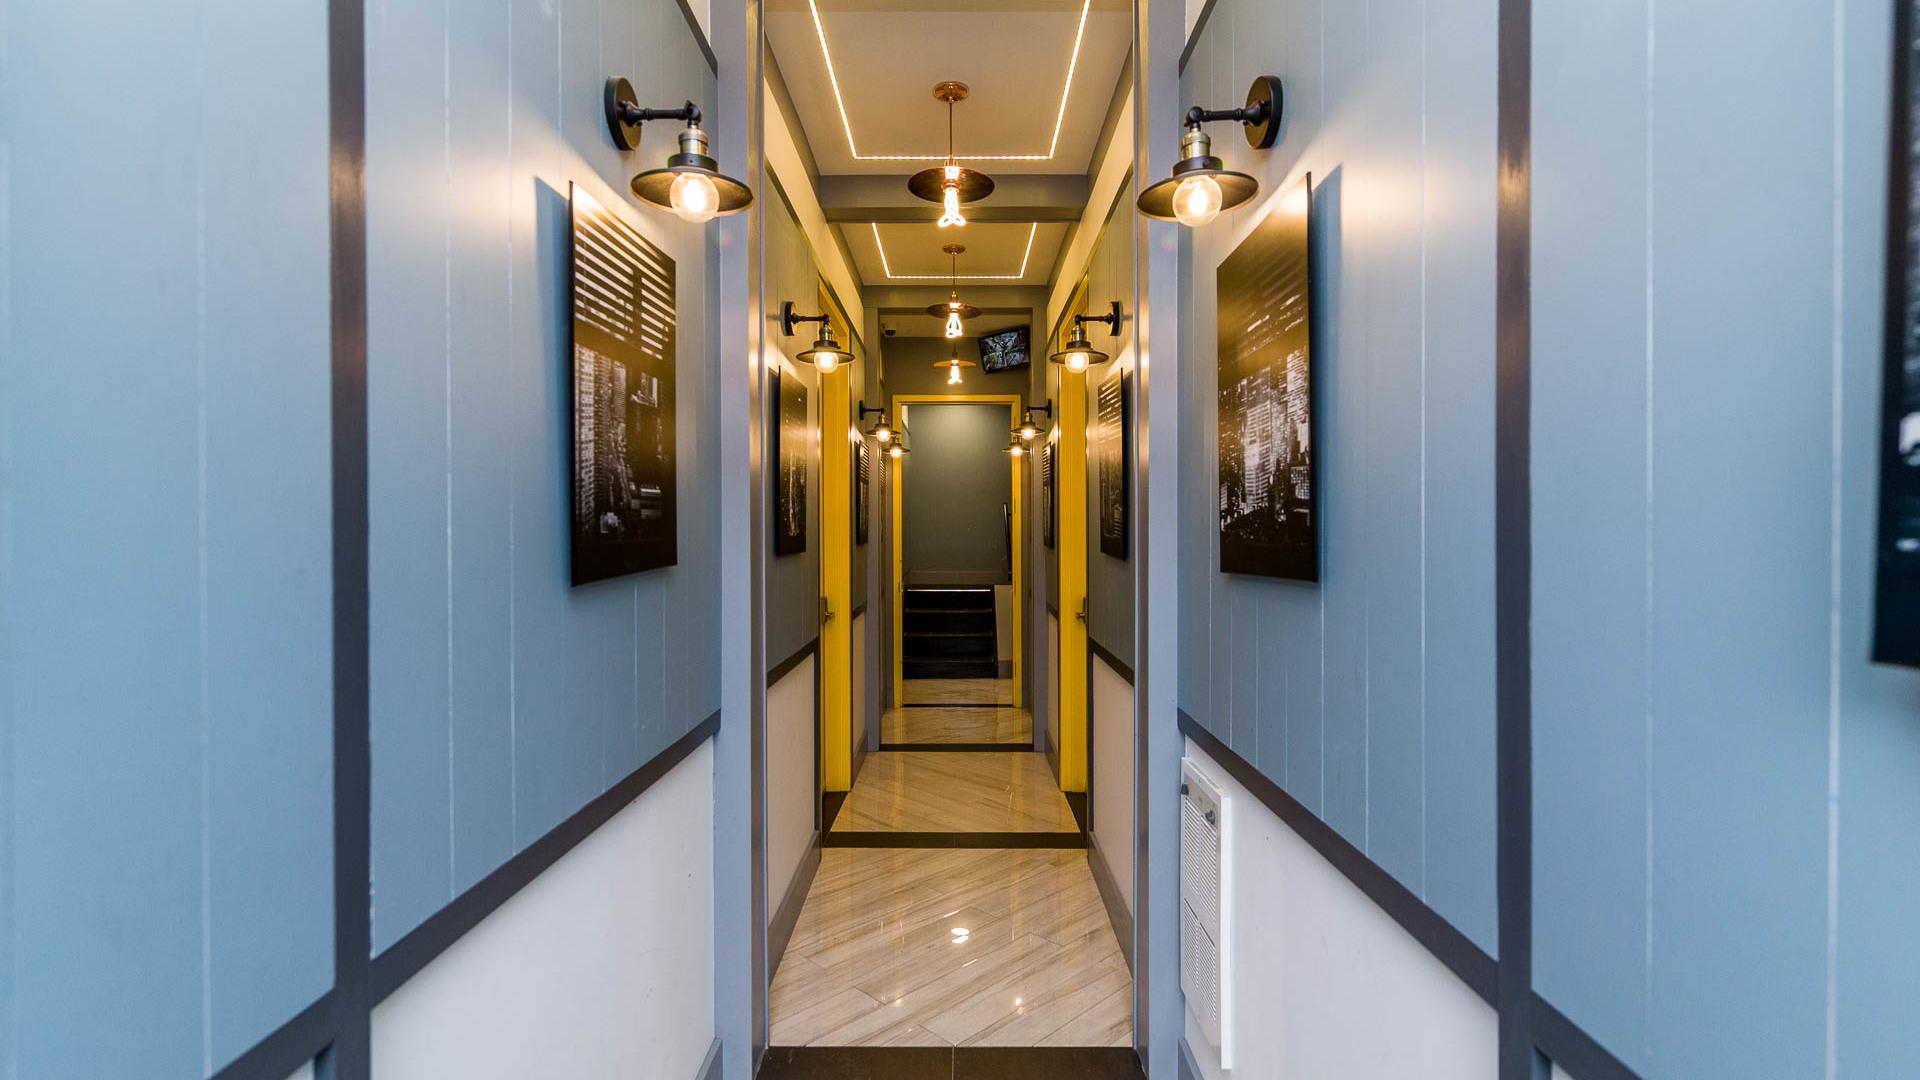 283 himrod street hallway 1